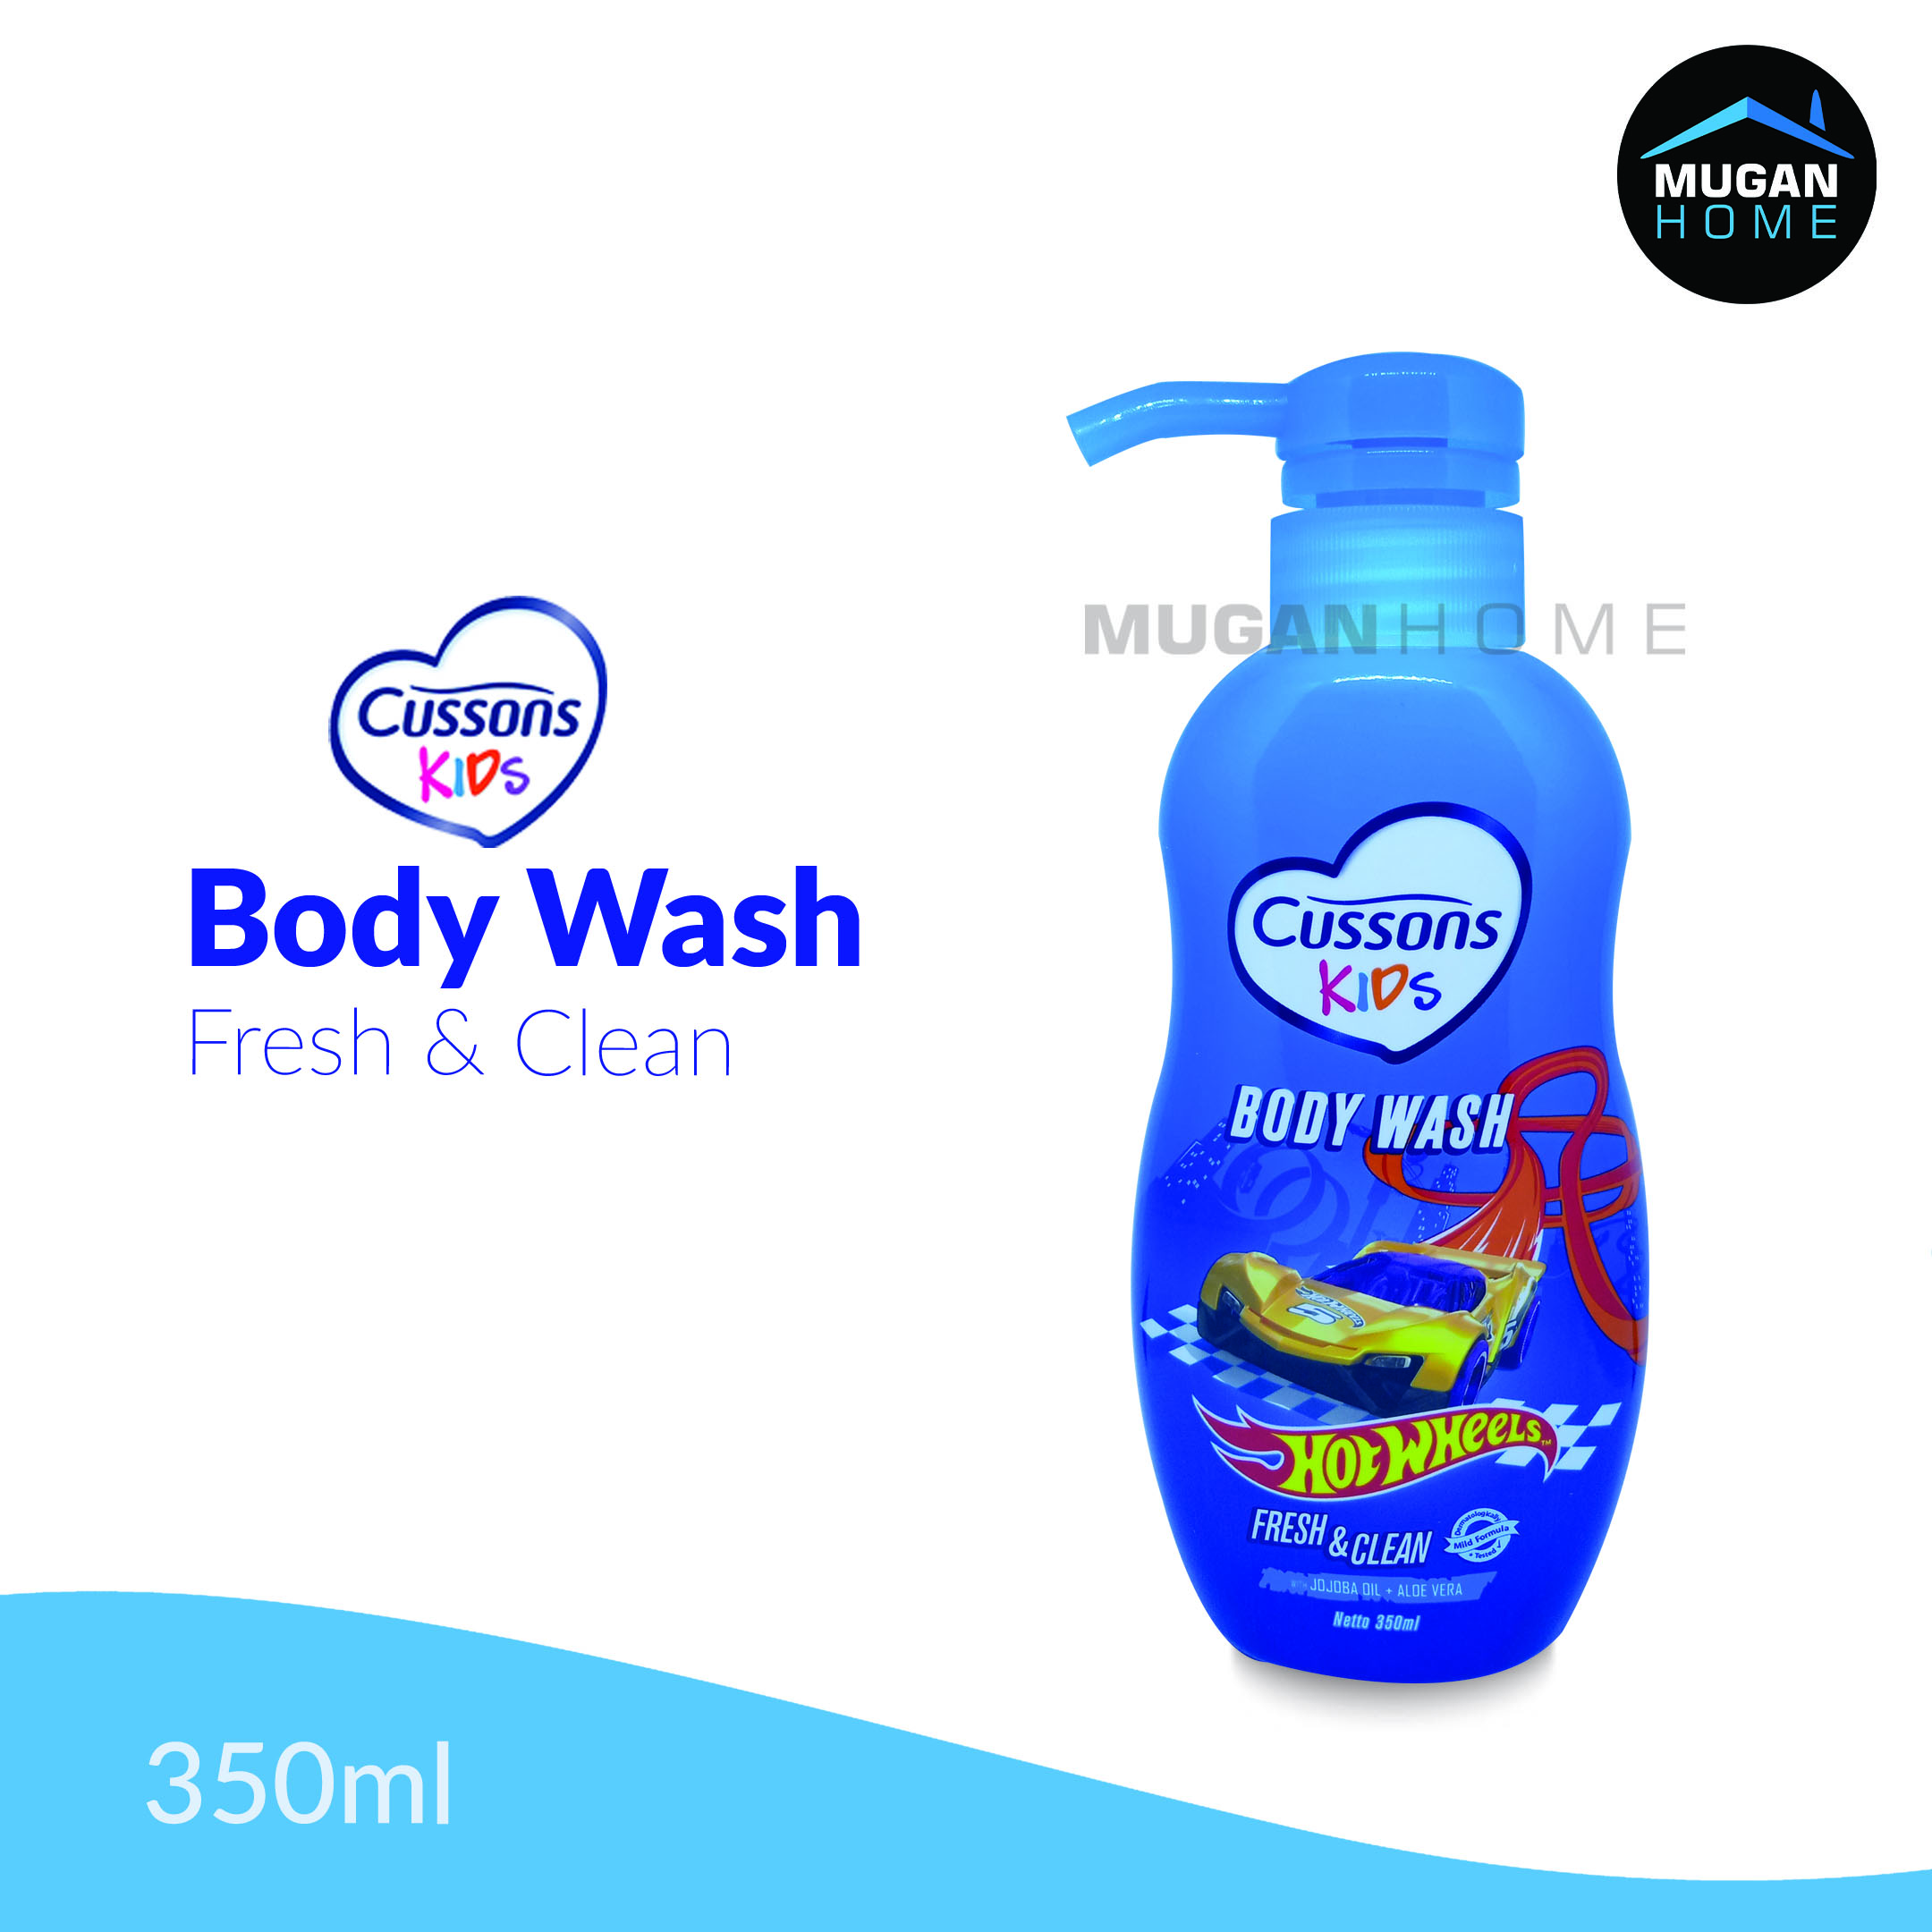 CUSSONS KIDS BODY WASH 350ML FRESH & CLEAN HOTWHEELS PUMP